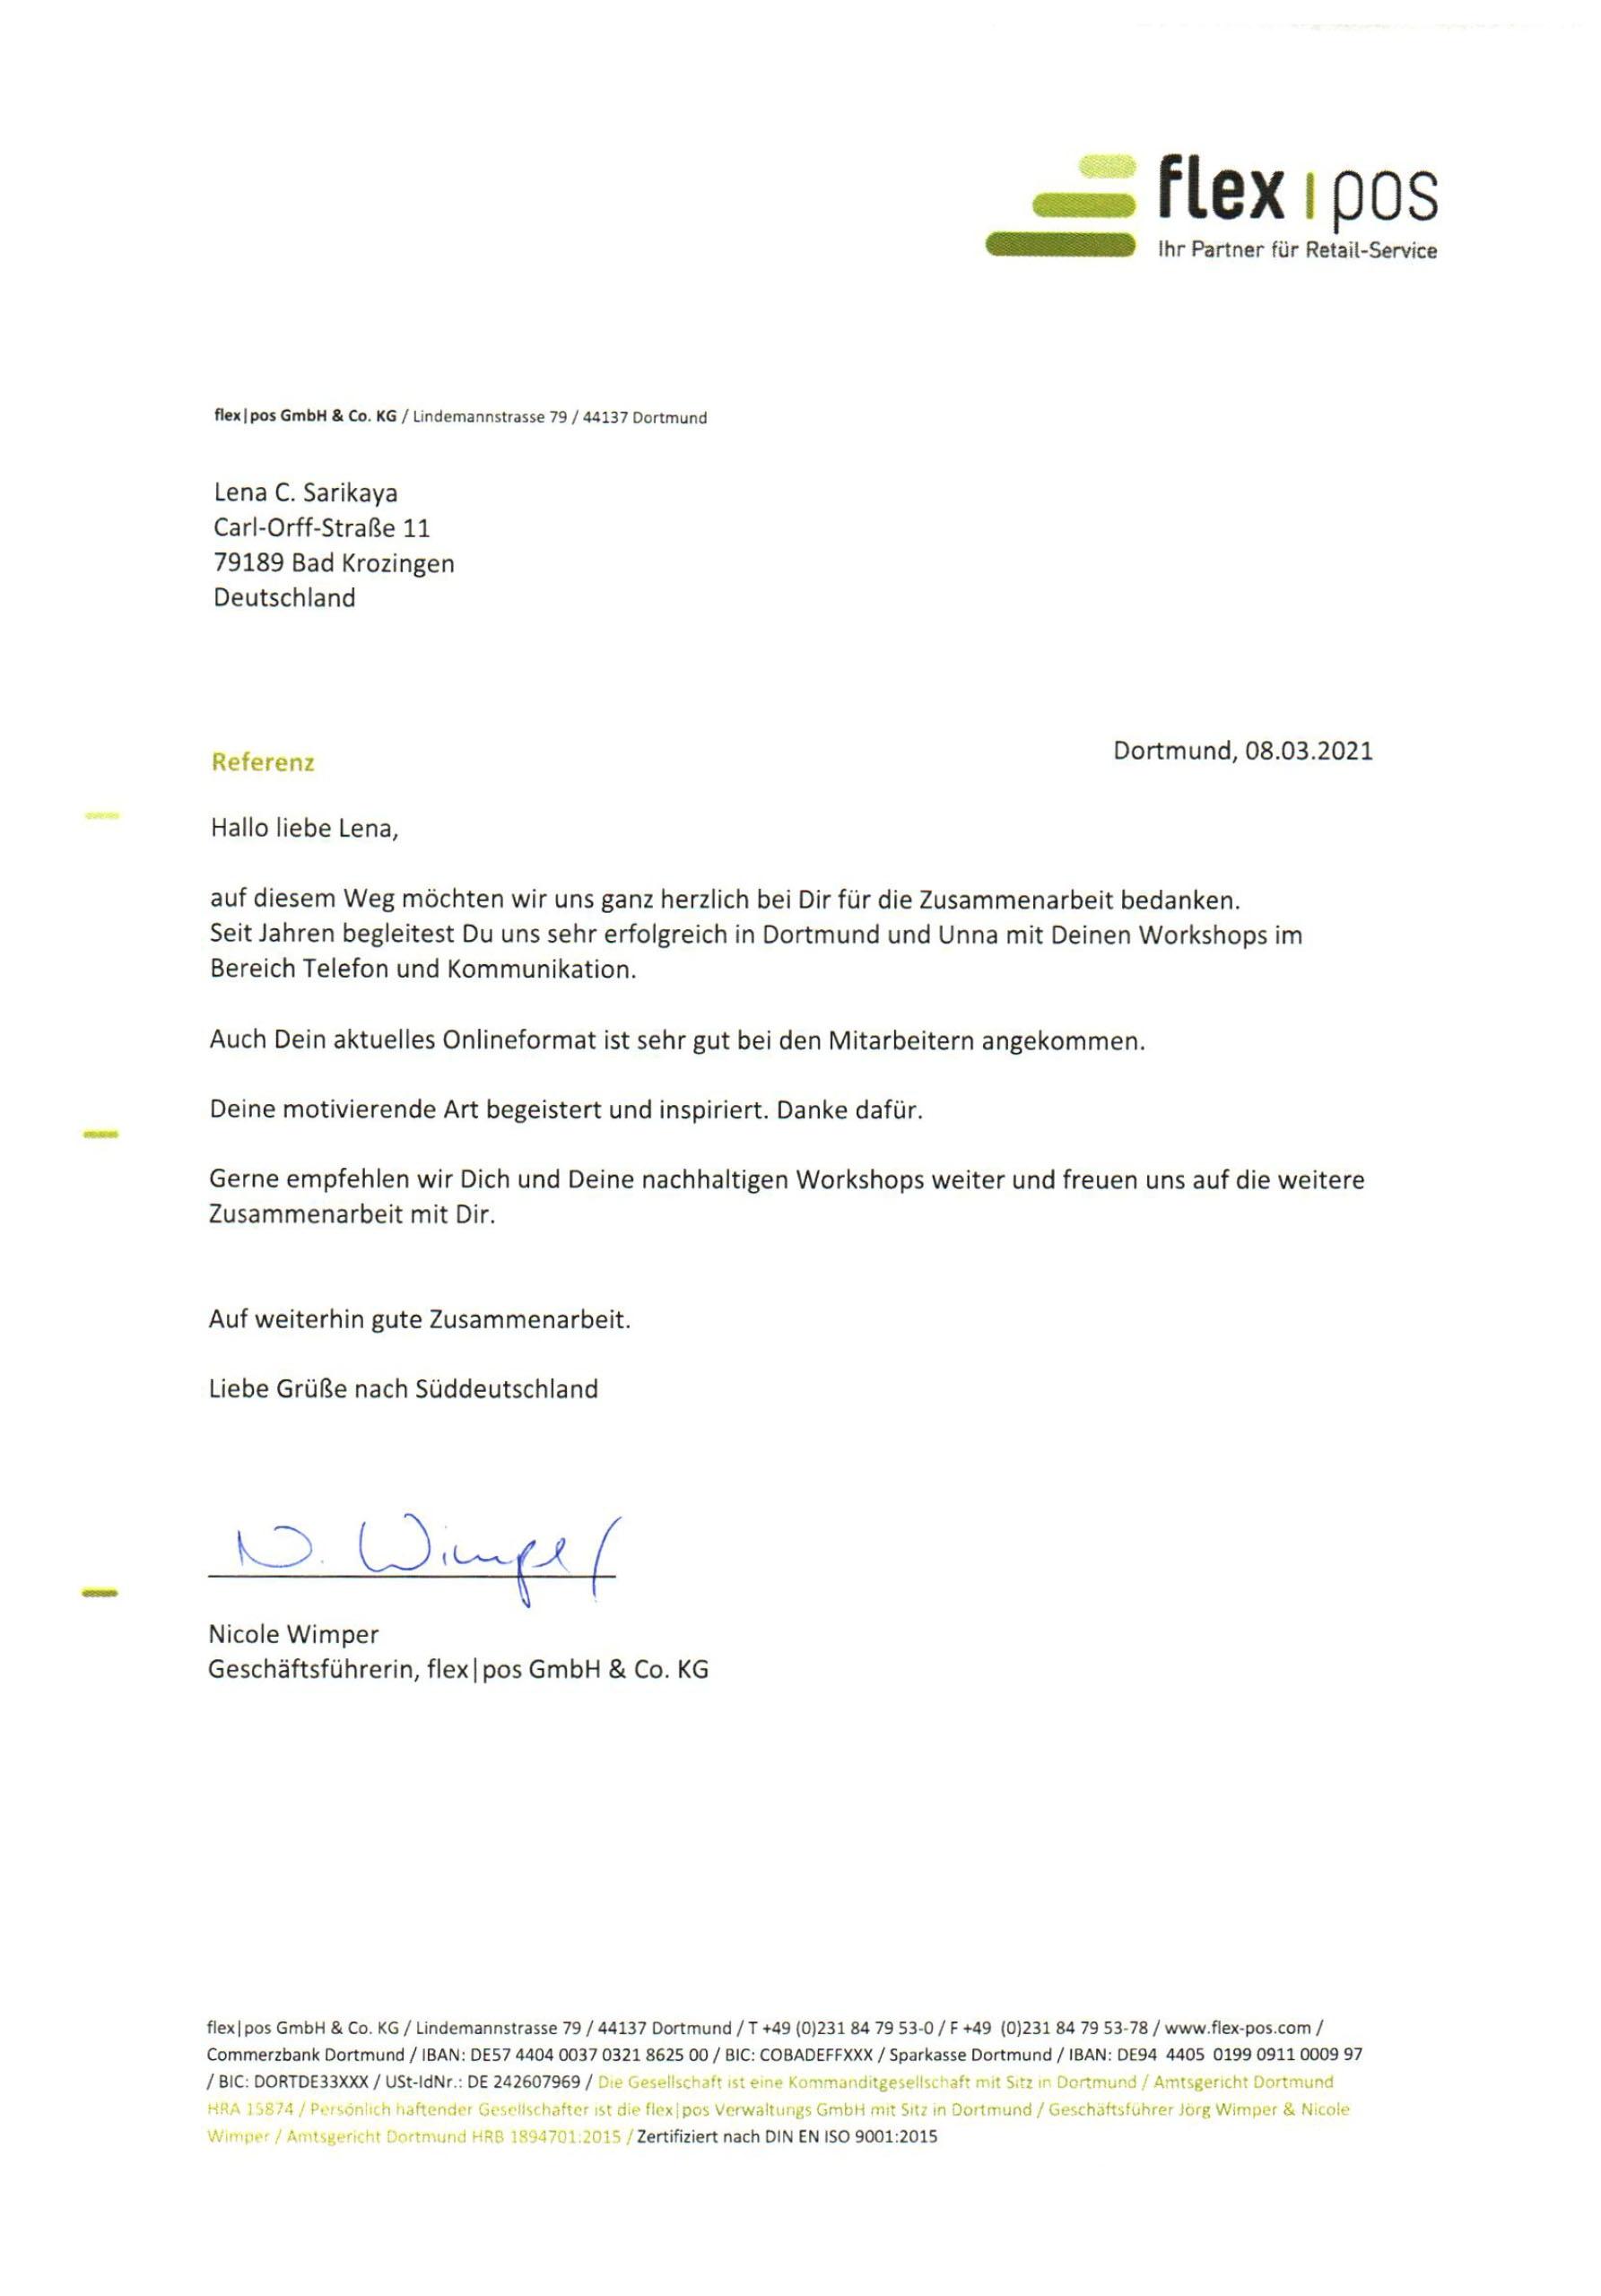 Bild Referenz flex pos GmbH & Co. KG